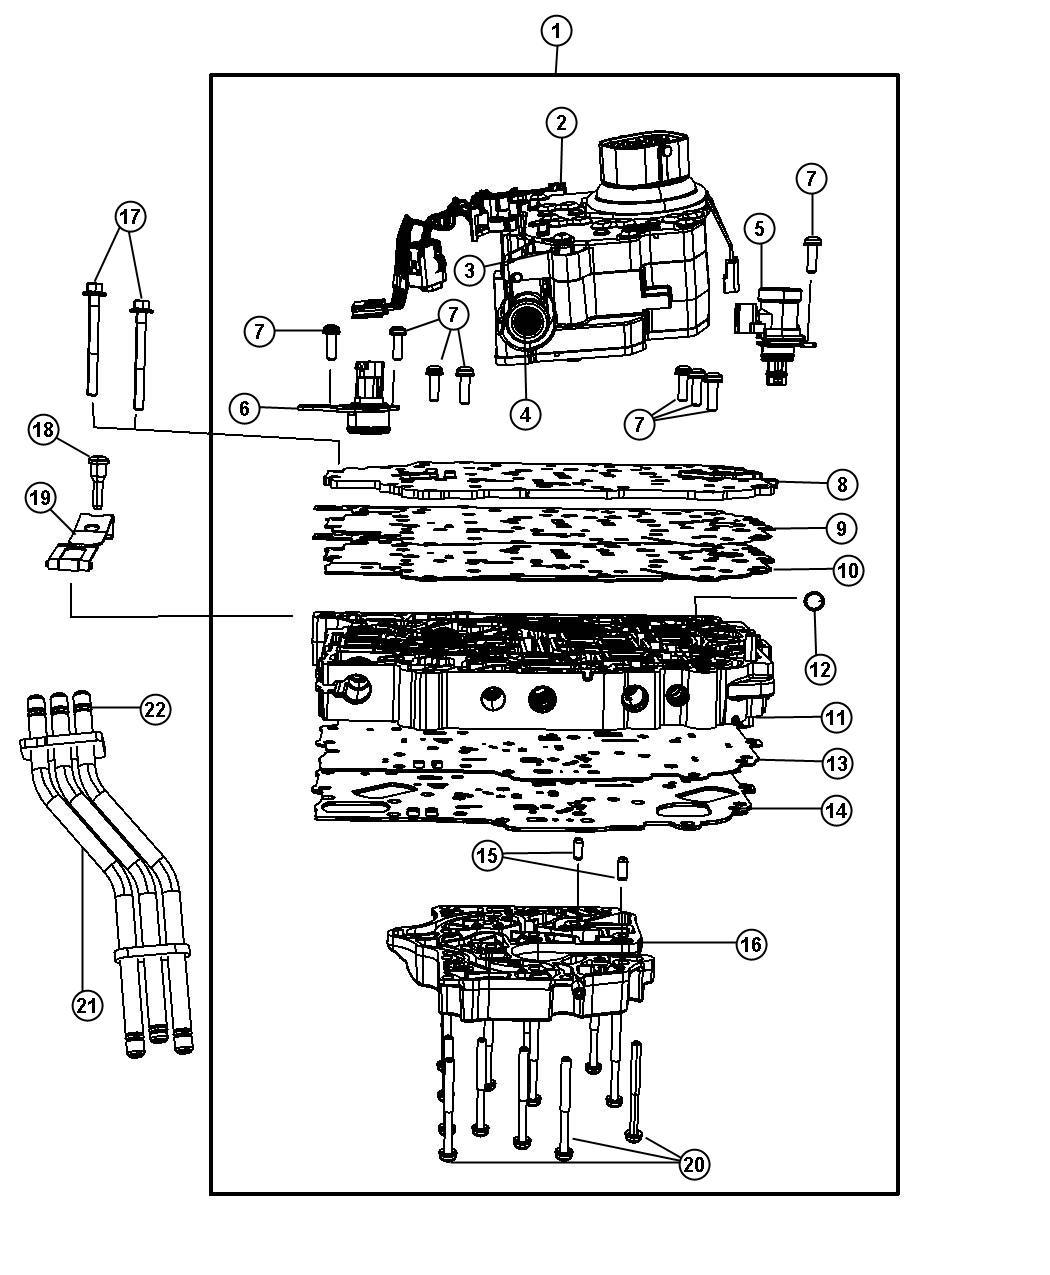 Dodge Grand Caravan Solenoid Module Transmission Wiring Diagram